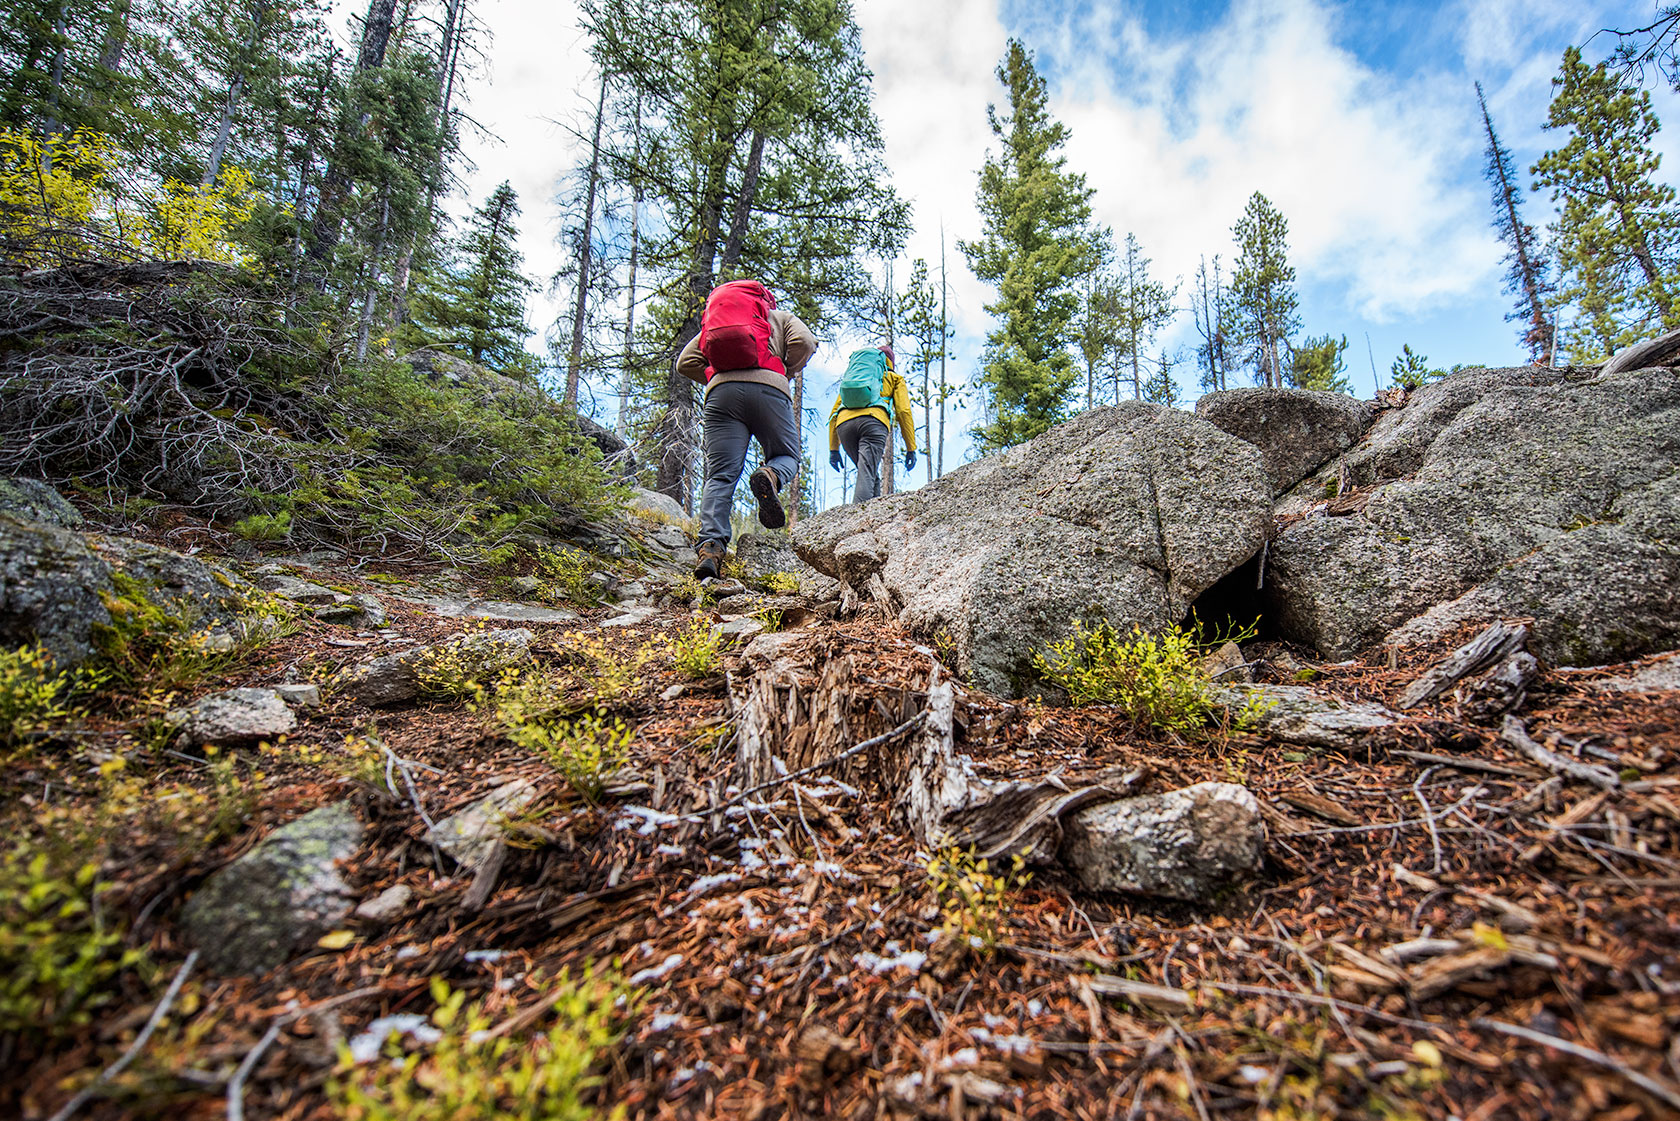 austin-trigg-patagonia-sawtooth-hiking-stanley-lake-advenure-wilderness-forest-idaho-outside-lifestyle-day-fall-weather-mountains-bushwhack.jpg